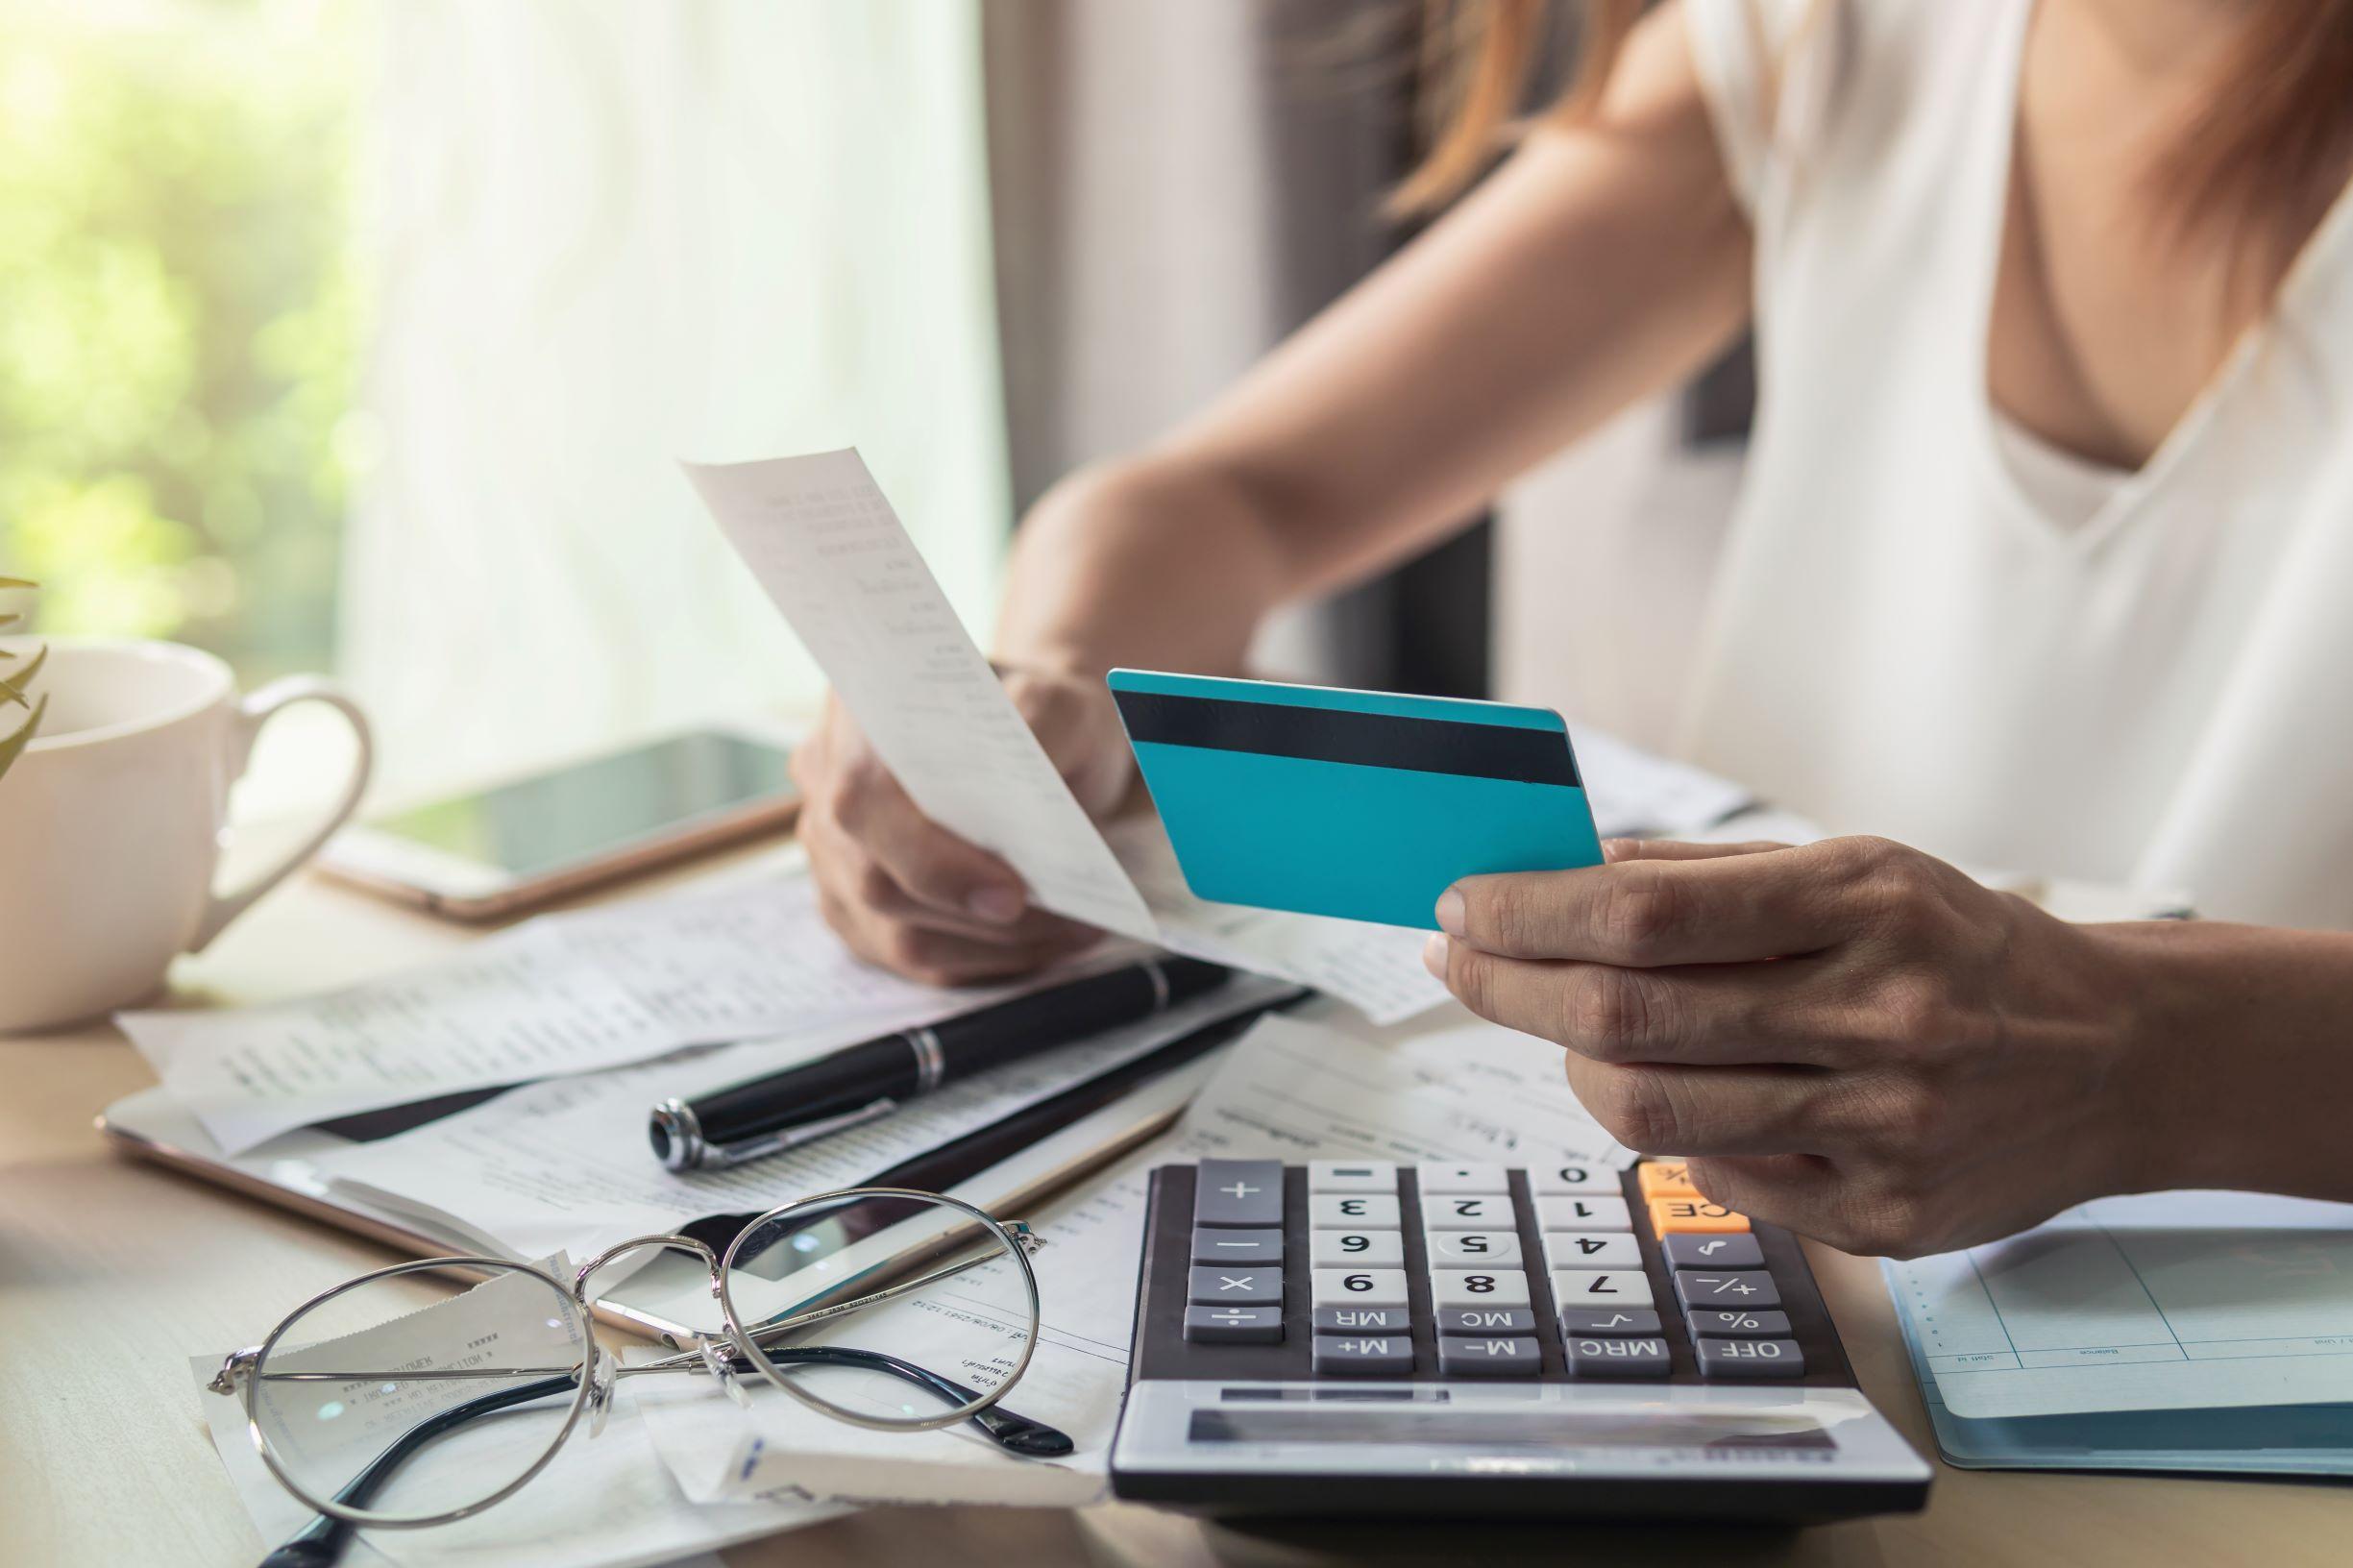 Woman calculating credit card bill